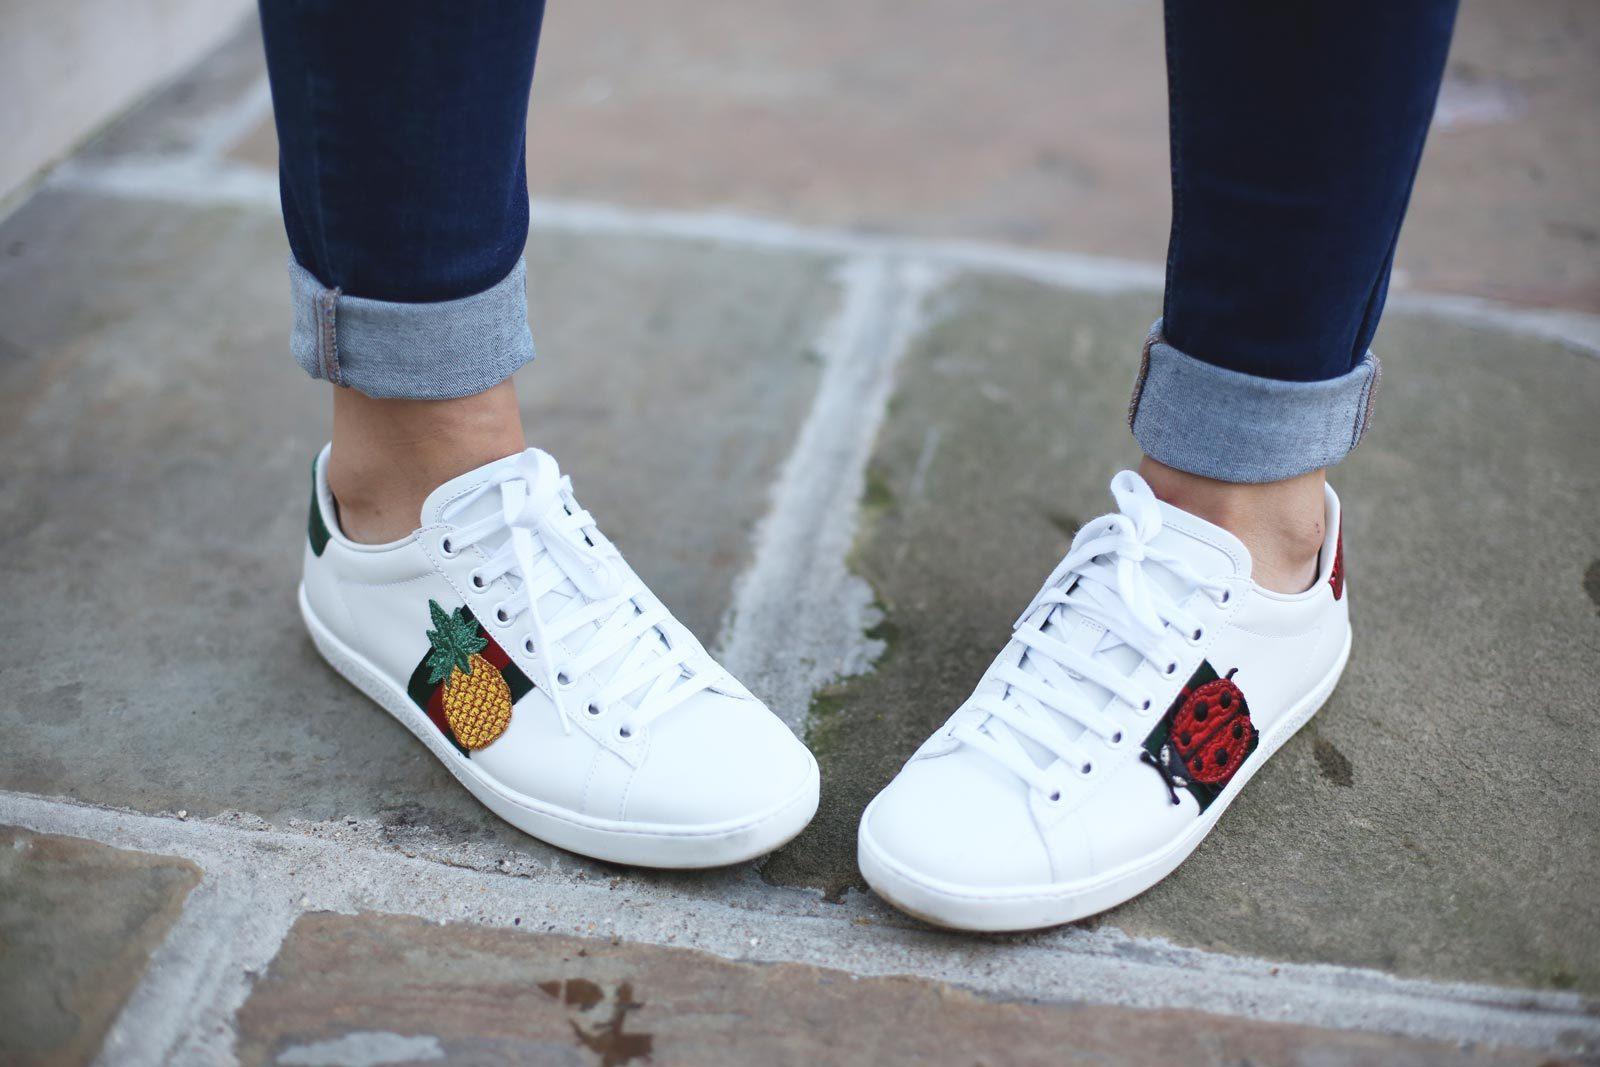 Moda Las De Zapatillas Estarán Que Esta Temporada lJFT1Kc3